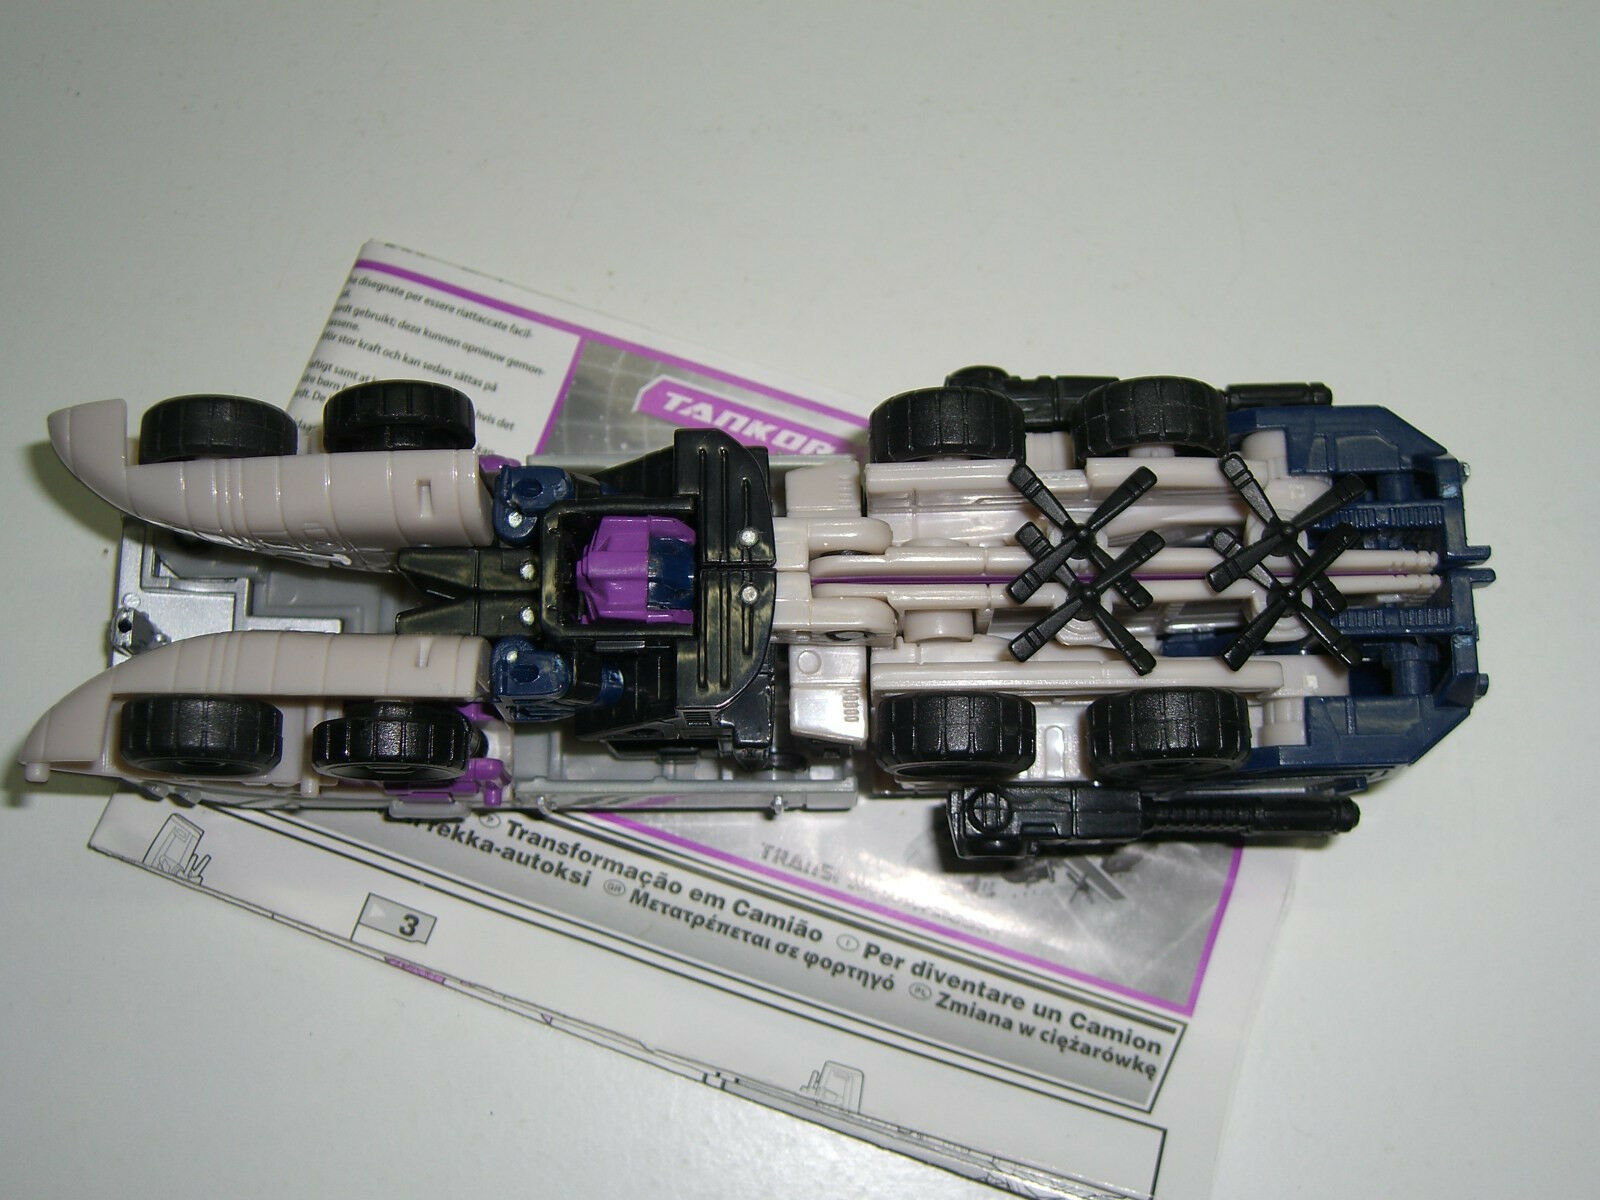 Transformers TANKOR OCTANE CLASSICS DELUXE GENERATIONS RTS FIGURE FIGURE FIGURE 100% COMPLETE 76bd52